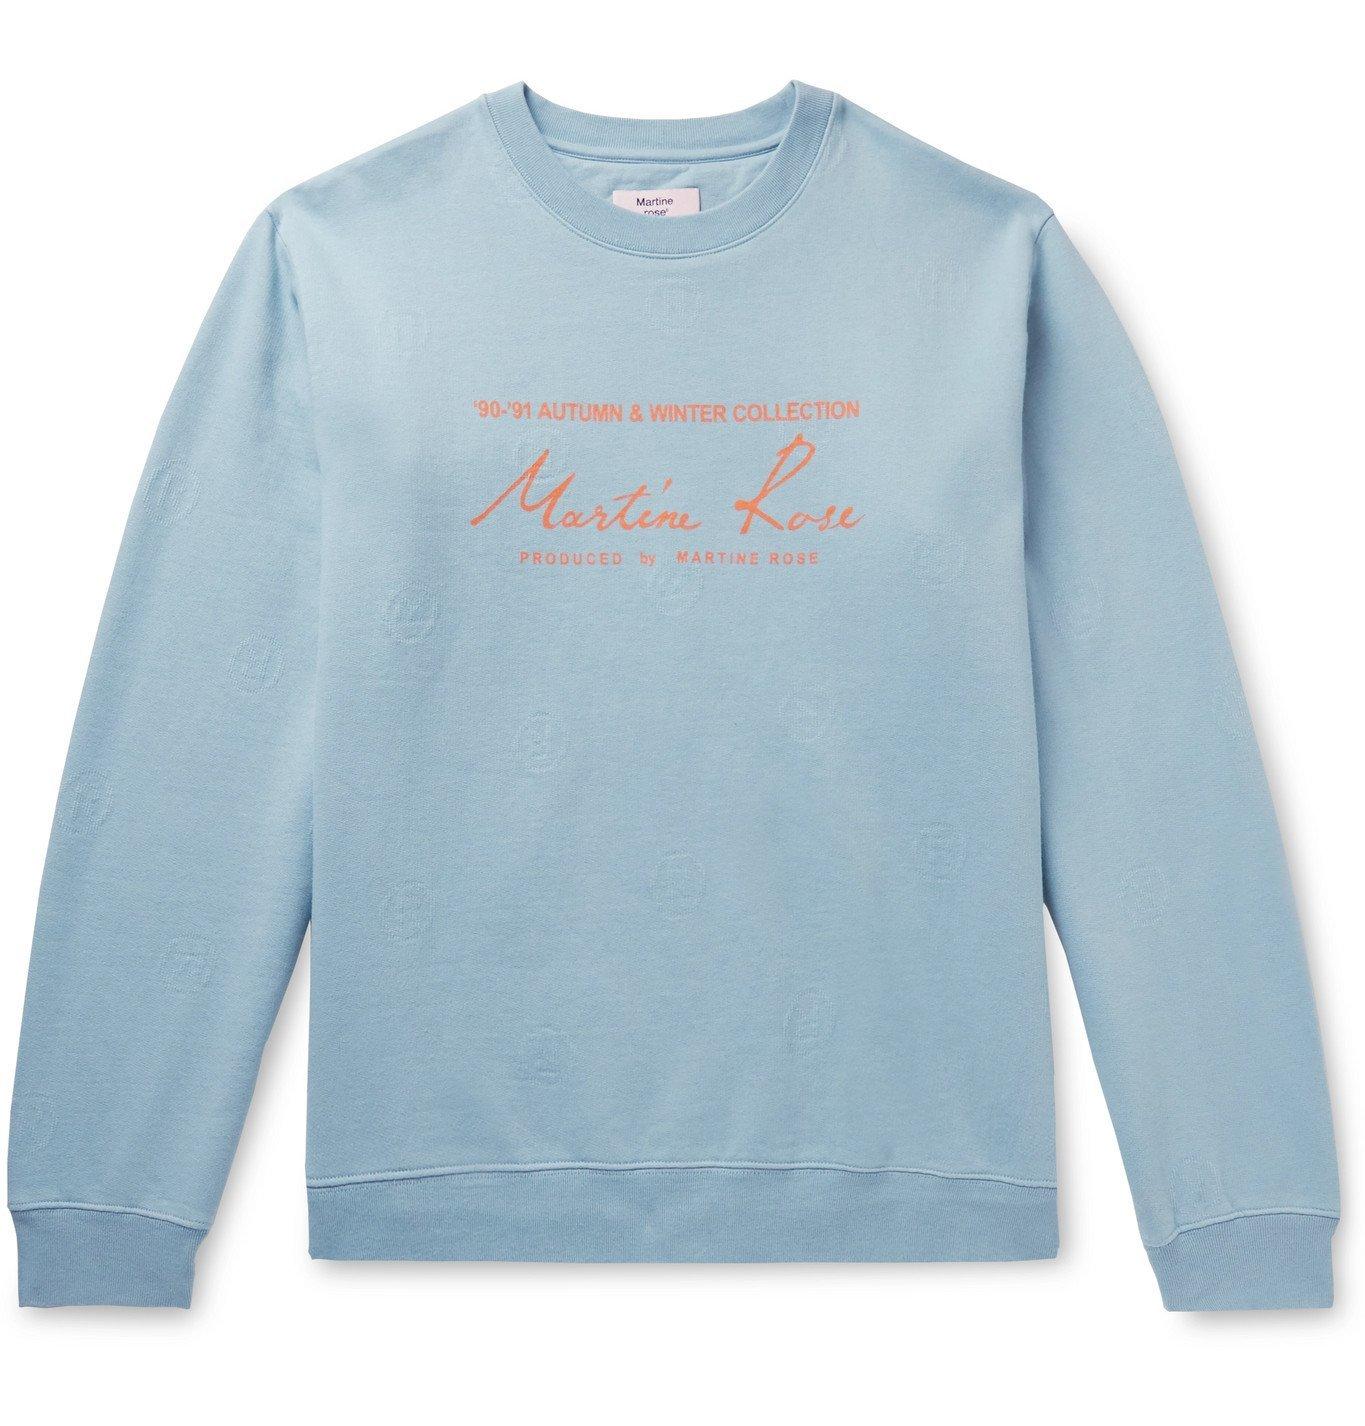 Martine Rose - Logo-Jacquard Printed Fleece-Back Cotton-Jersey Sweatshirt - Blue